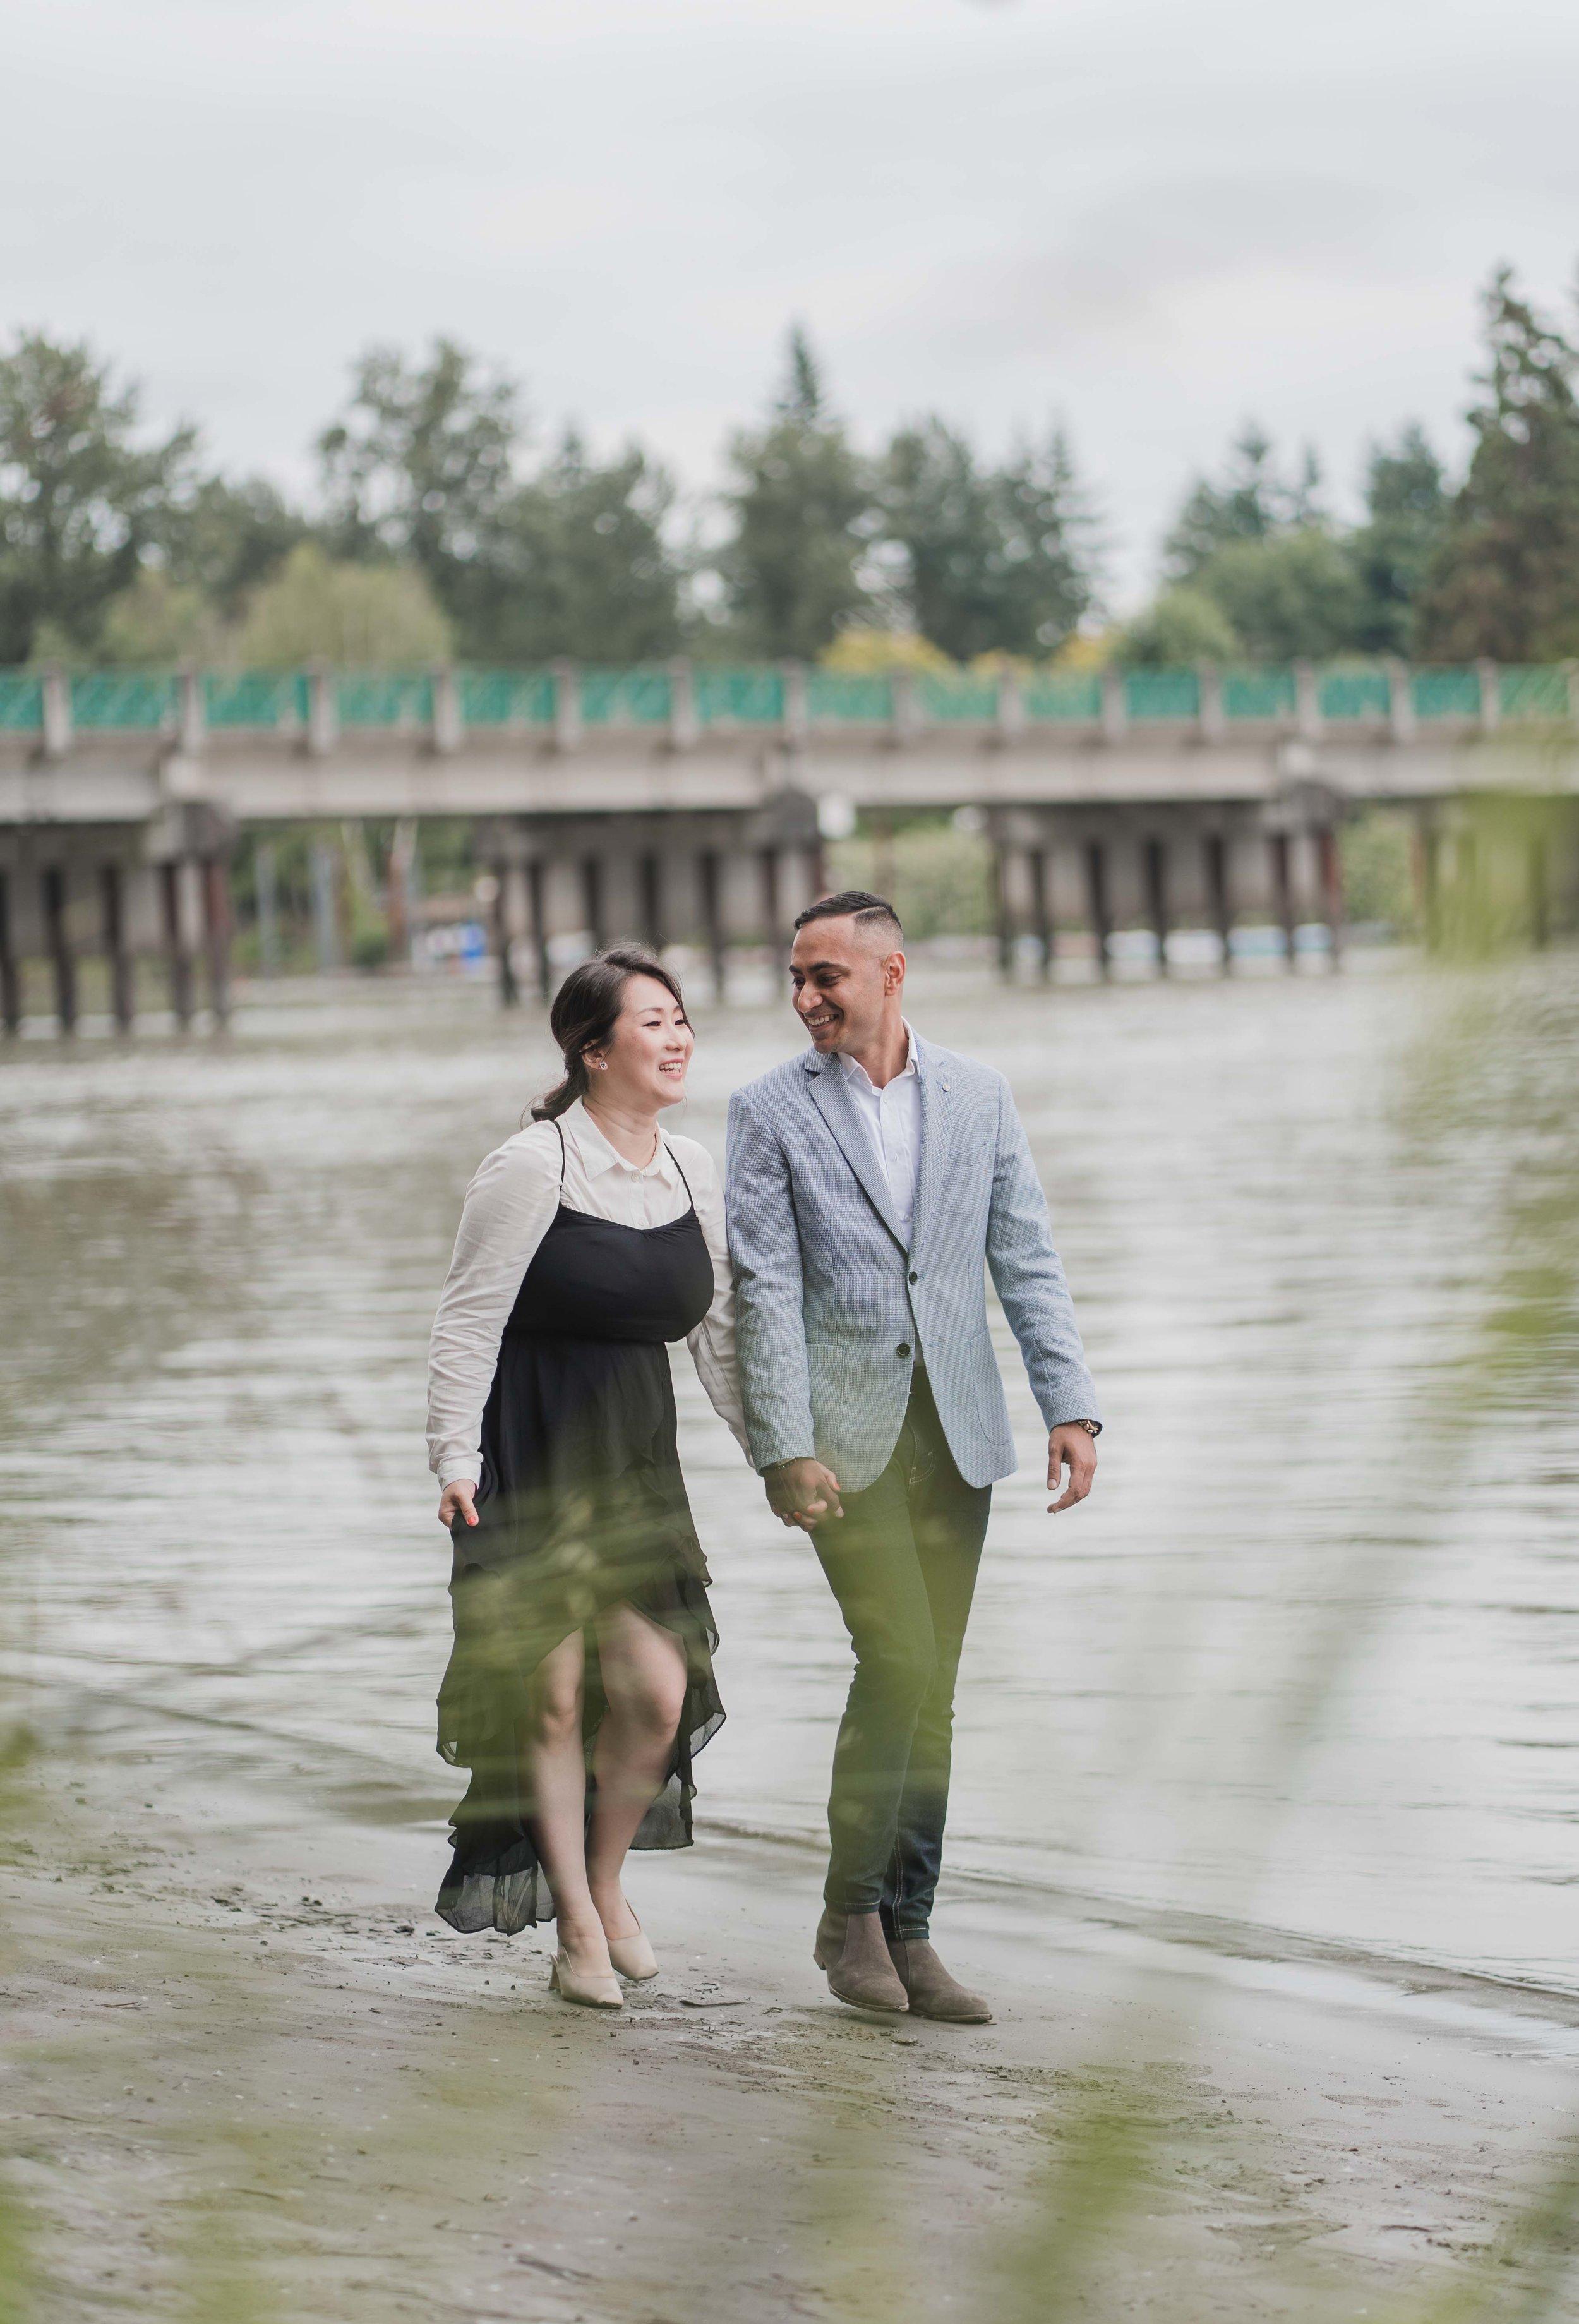 20190622 - Monika & Johnson Engagement - 0117.jpg